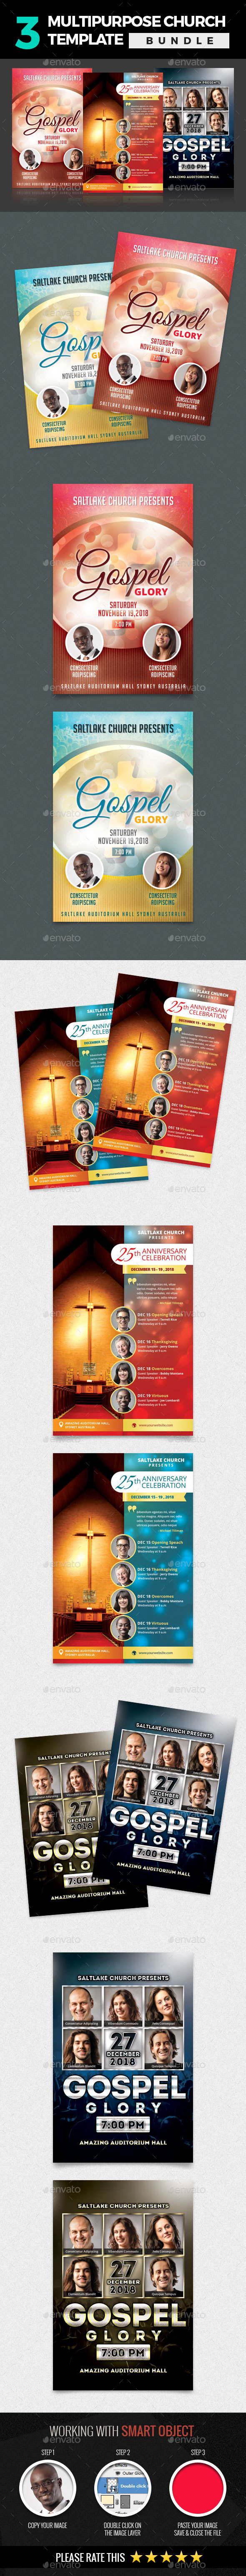 3 In 1 Multipurpose Church  Template Bundle - Church Flyers